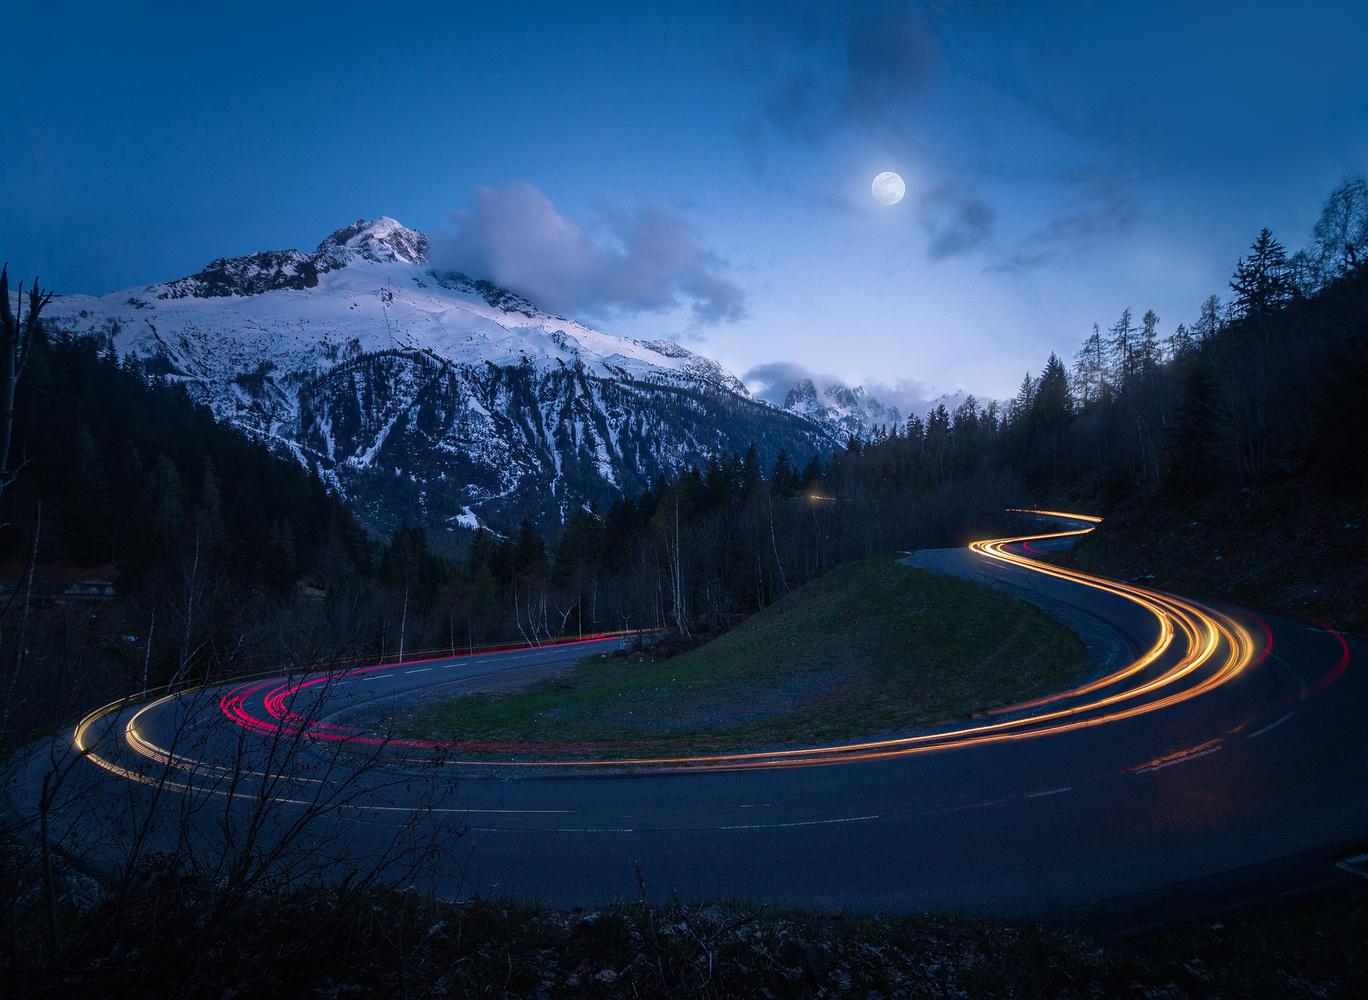 Serpentine Road by Christian Möhrle